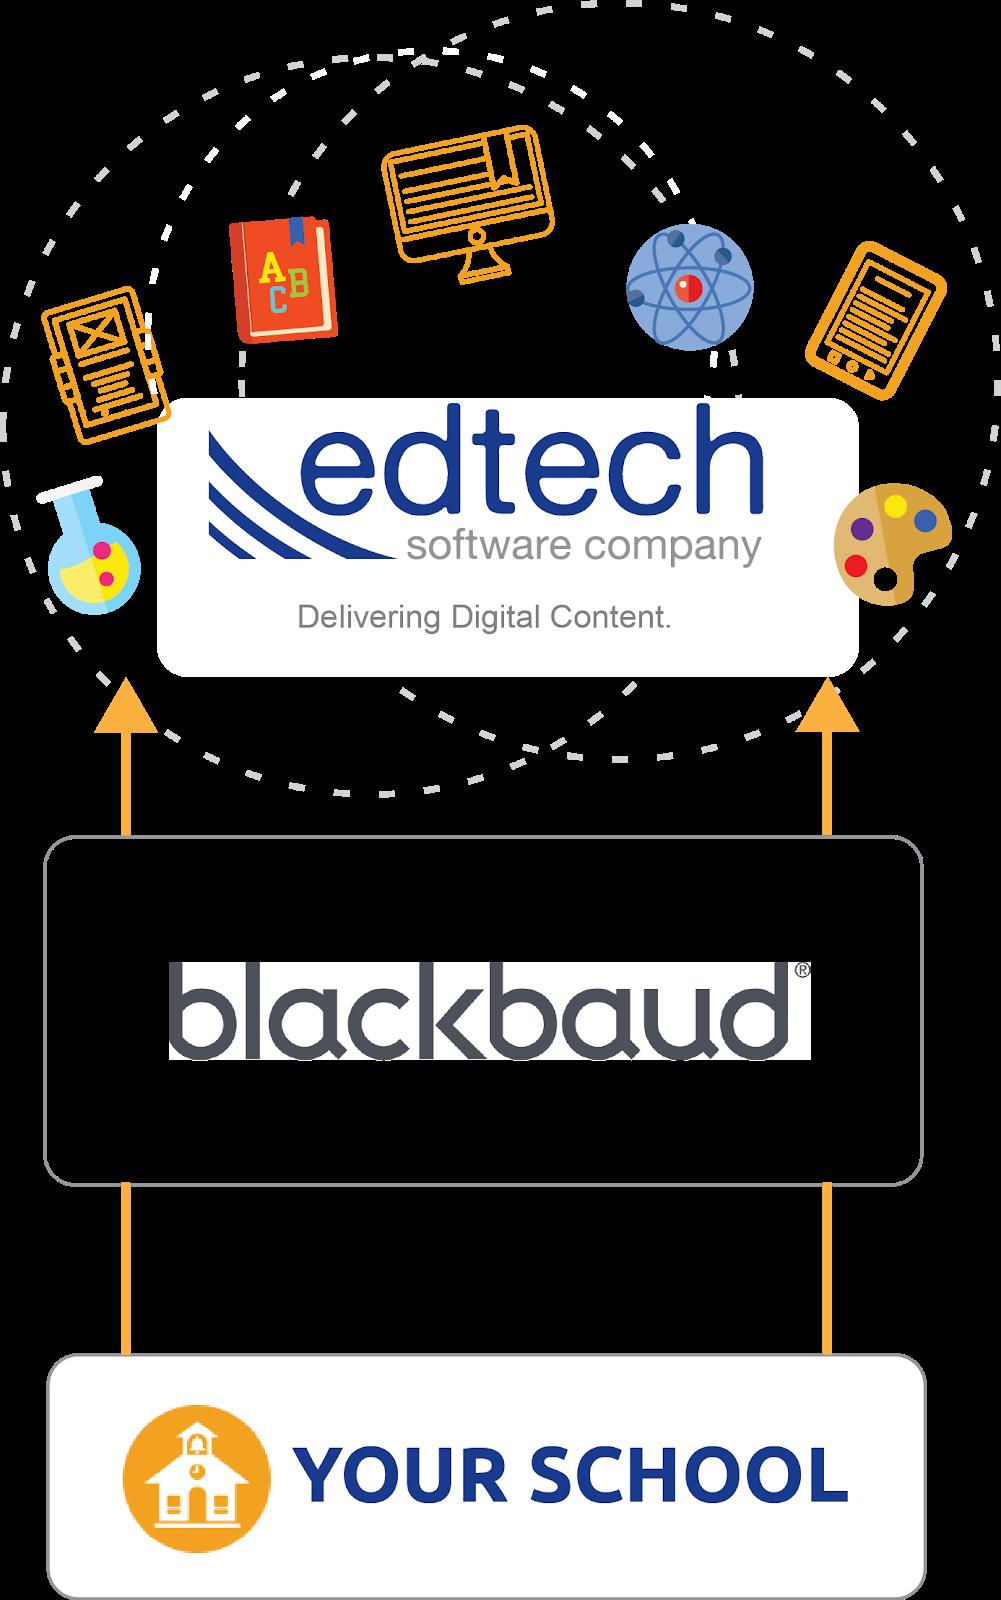 EdTech_Blackbaud